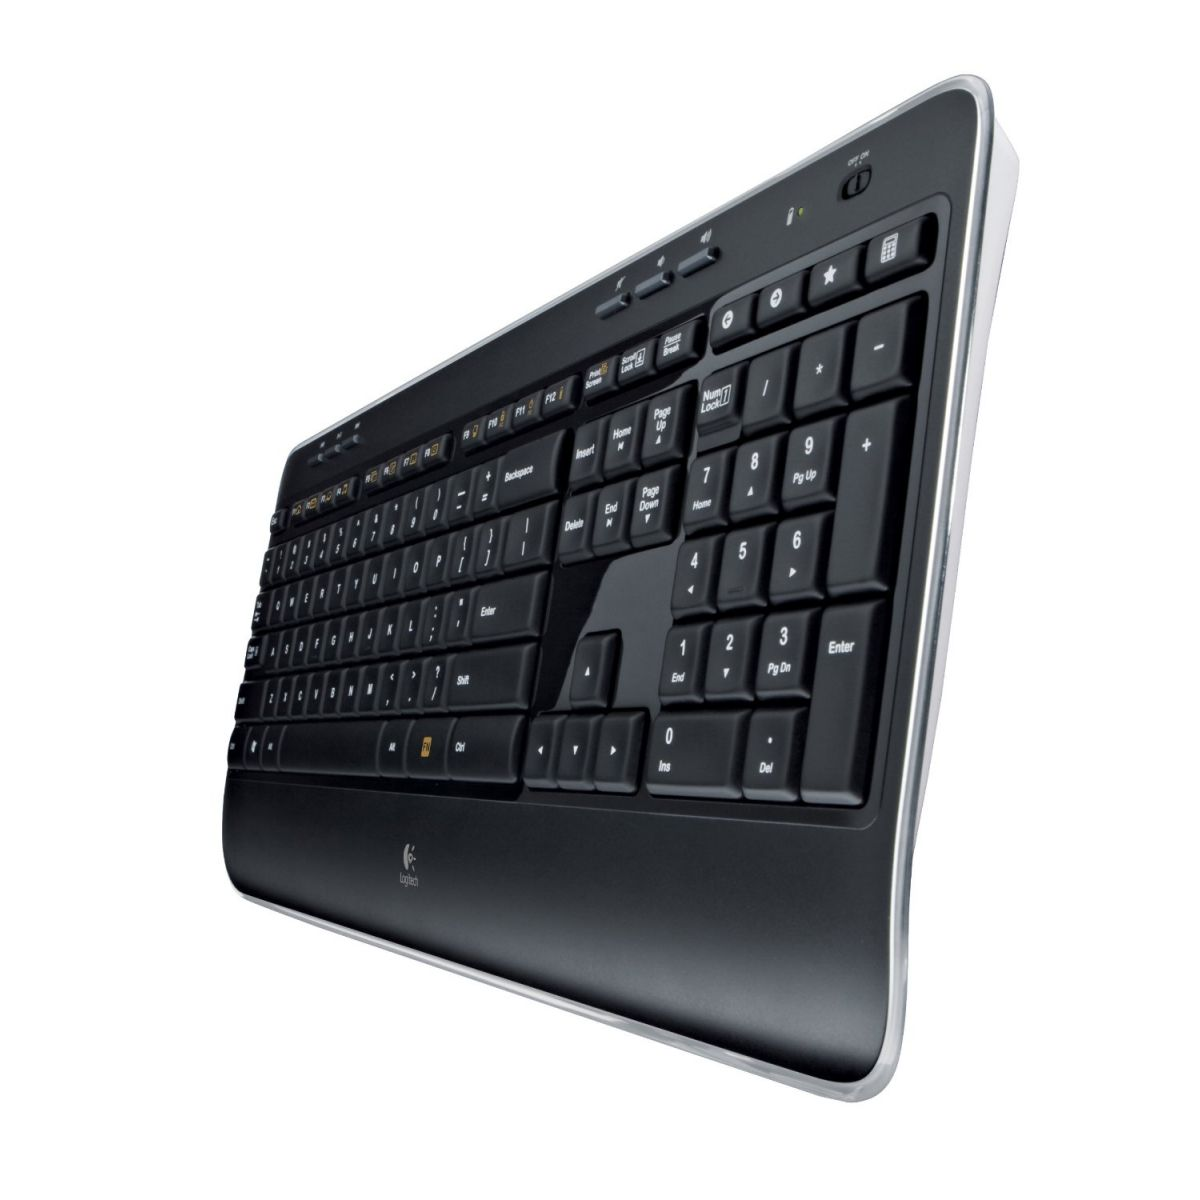 Teclado e Mouse Wireless Combo MK520 920-002594 - Logitech